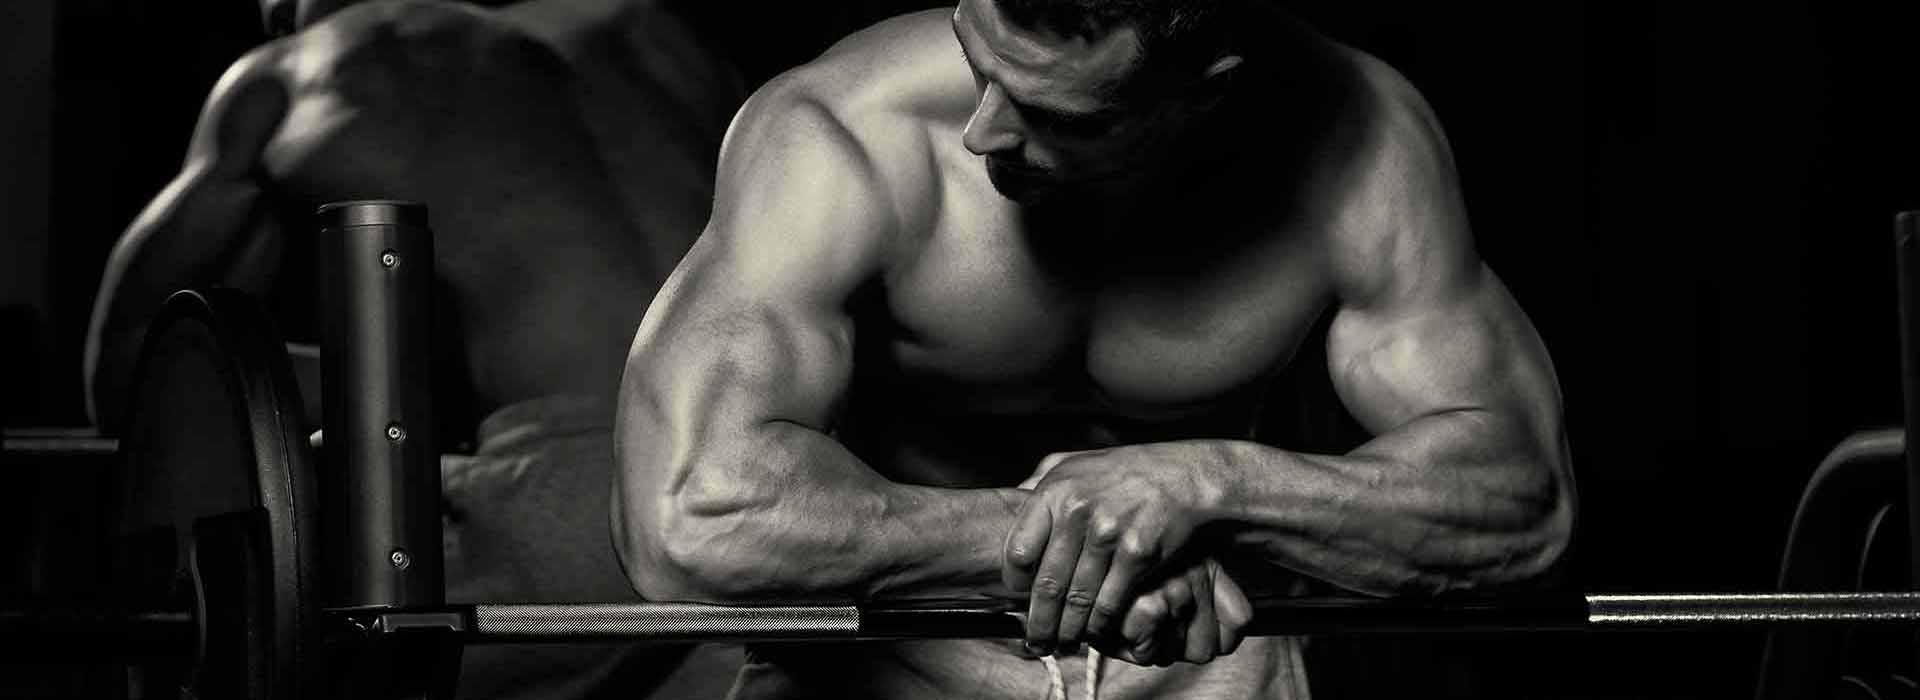 Muskulöser Mann mit stark muskulösen Armen, Brust und Sixpack